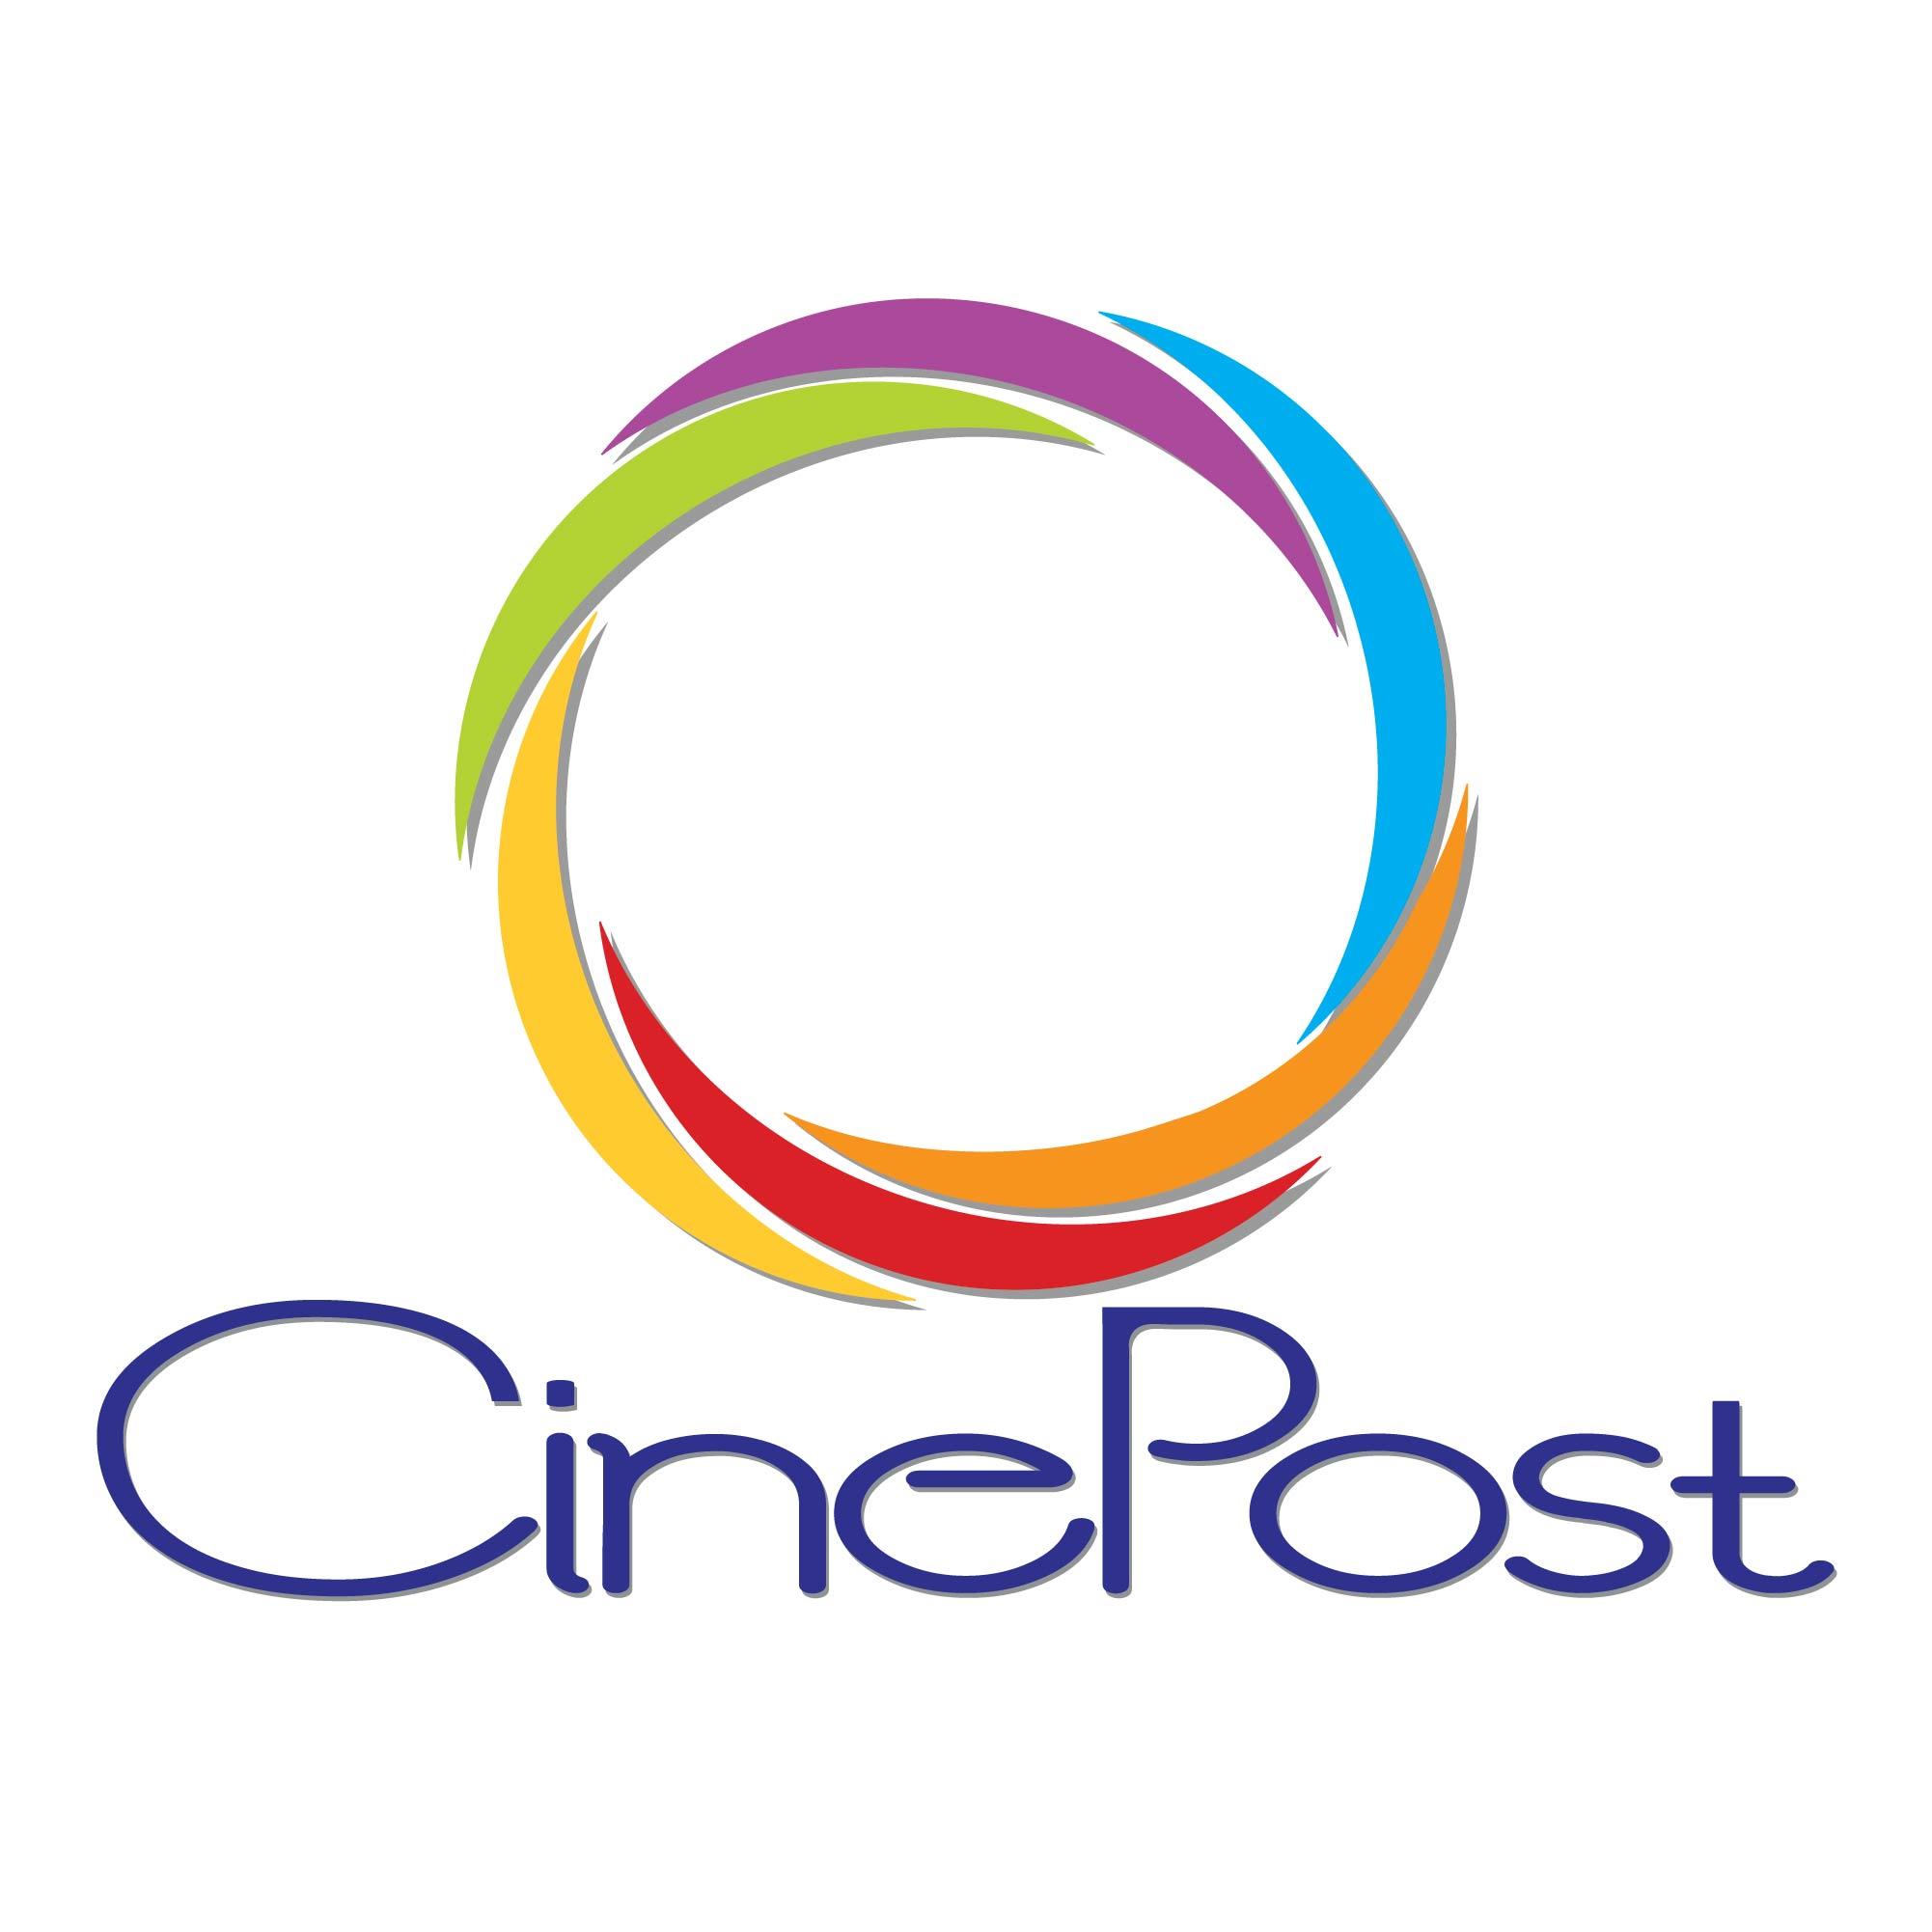 A CinePost.jpg